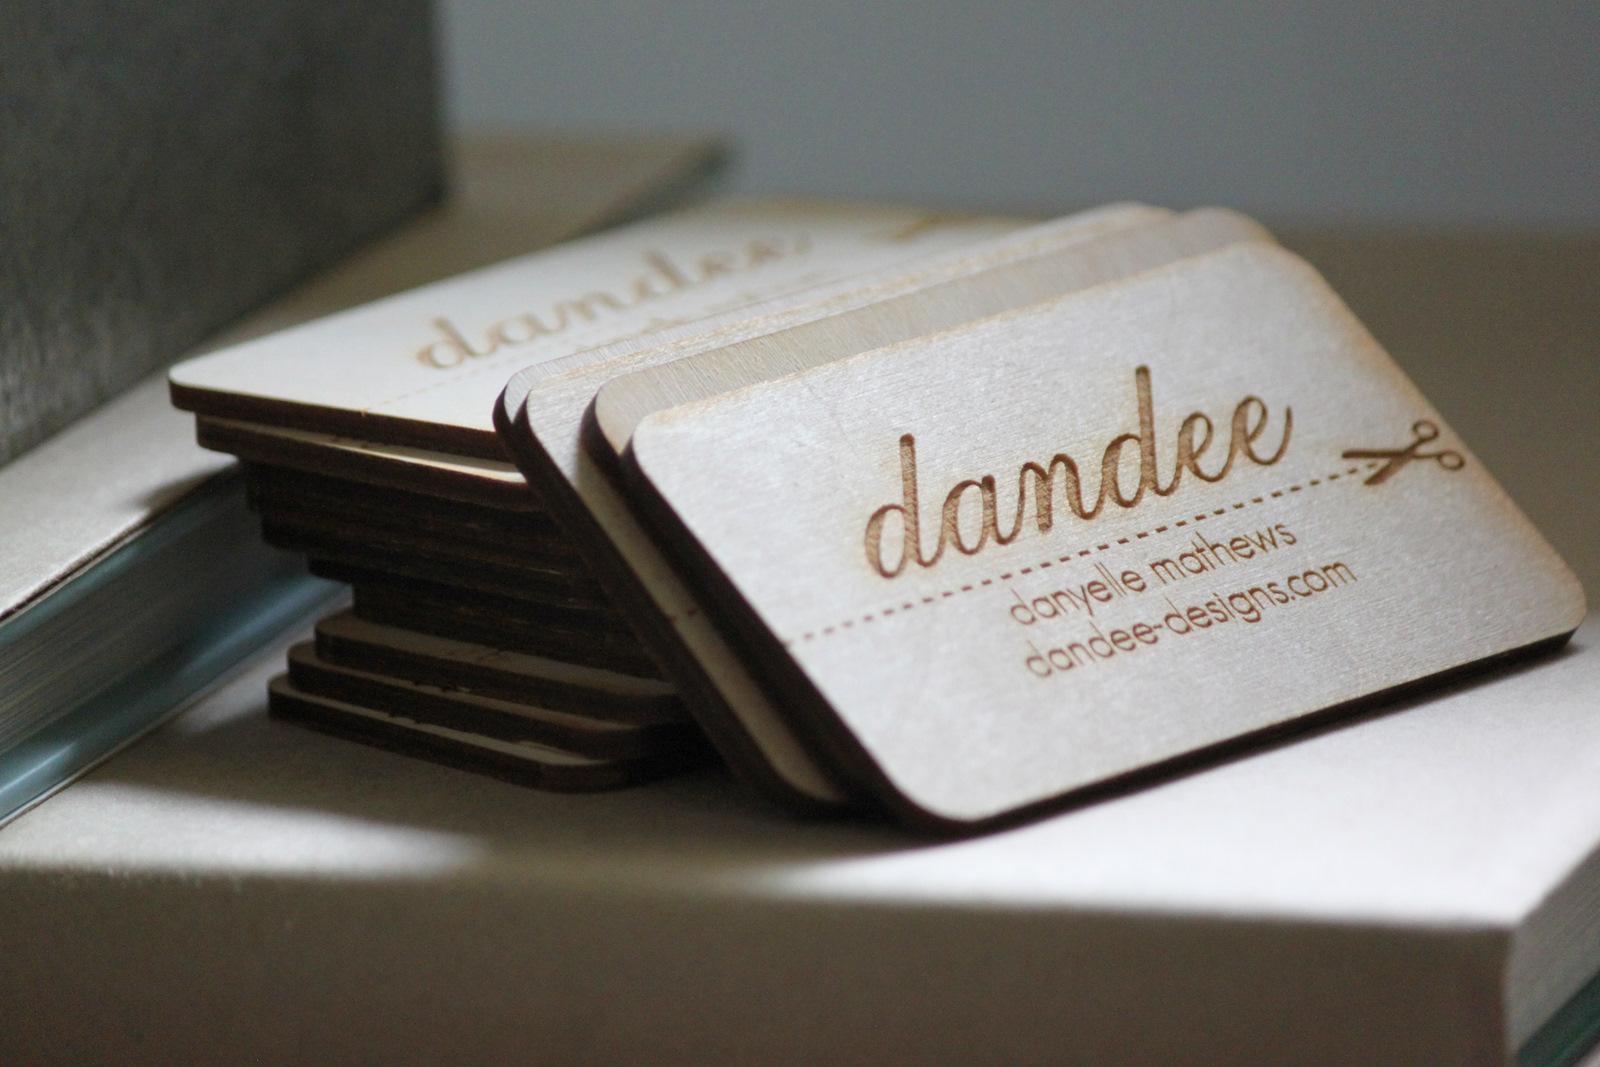 Simple Tarjeta De Presentacin En Ingls  Business Card  Modelo